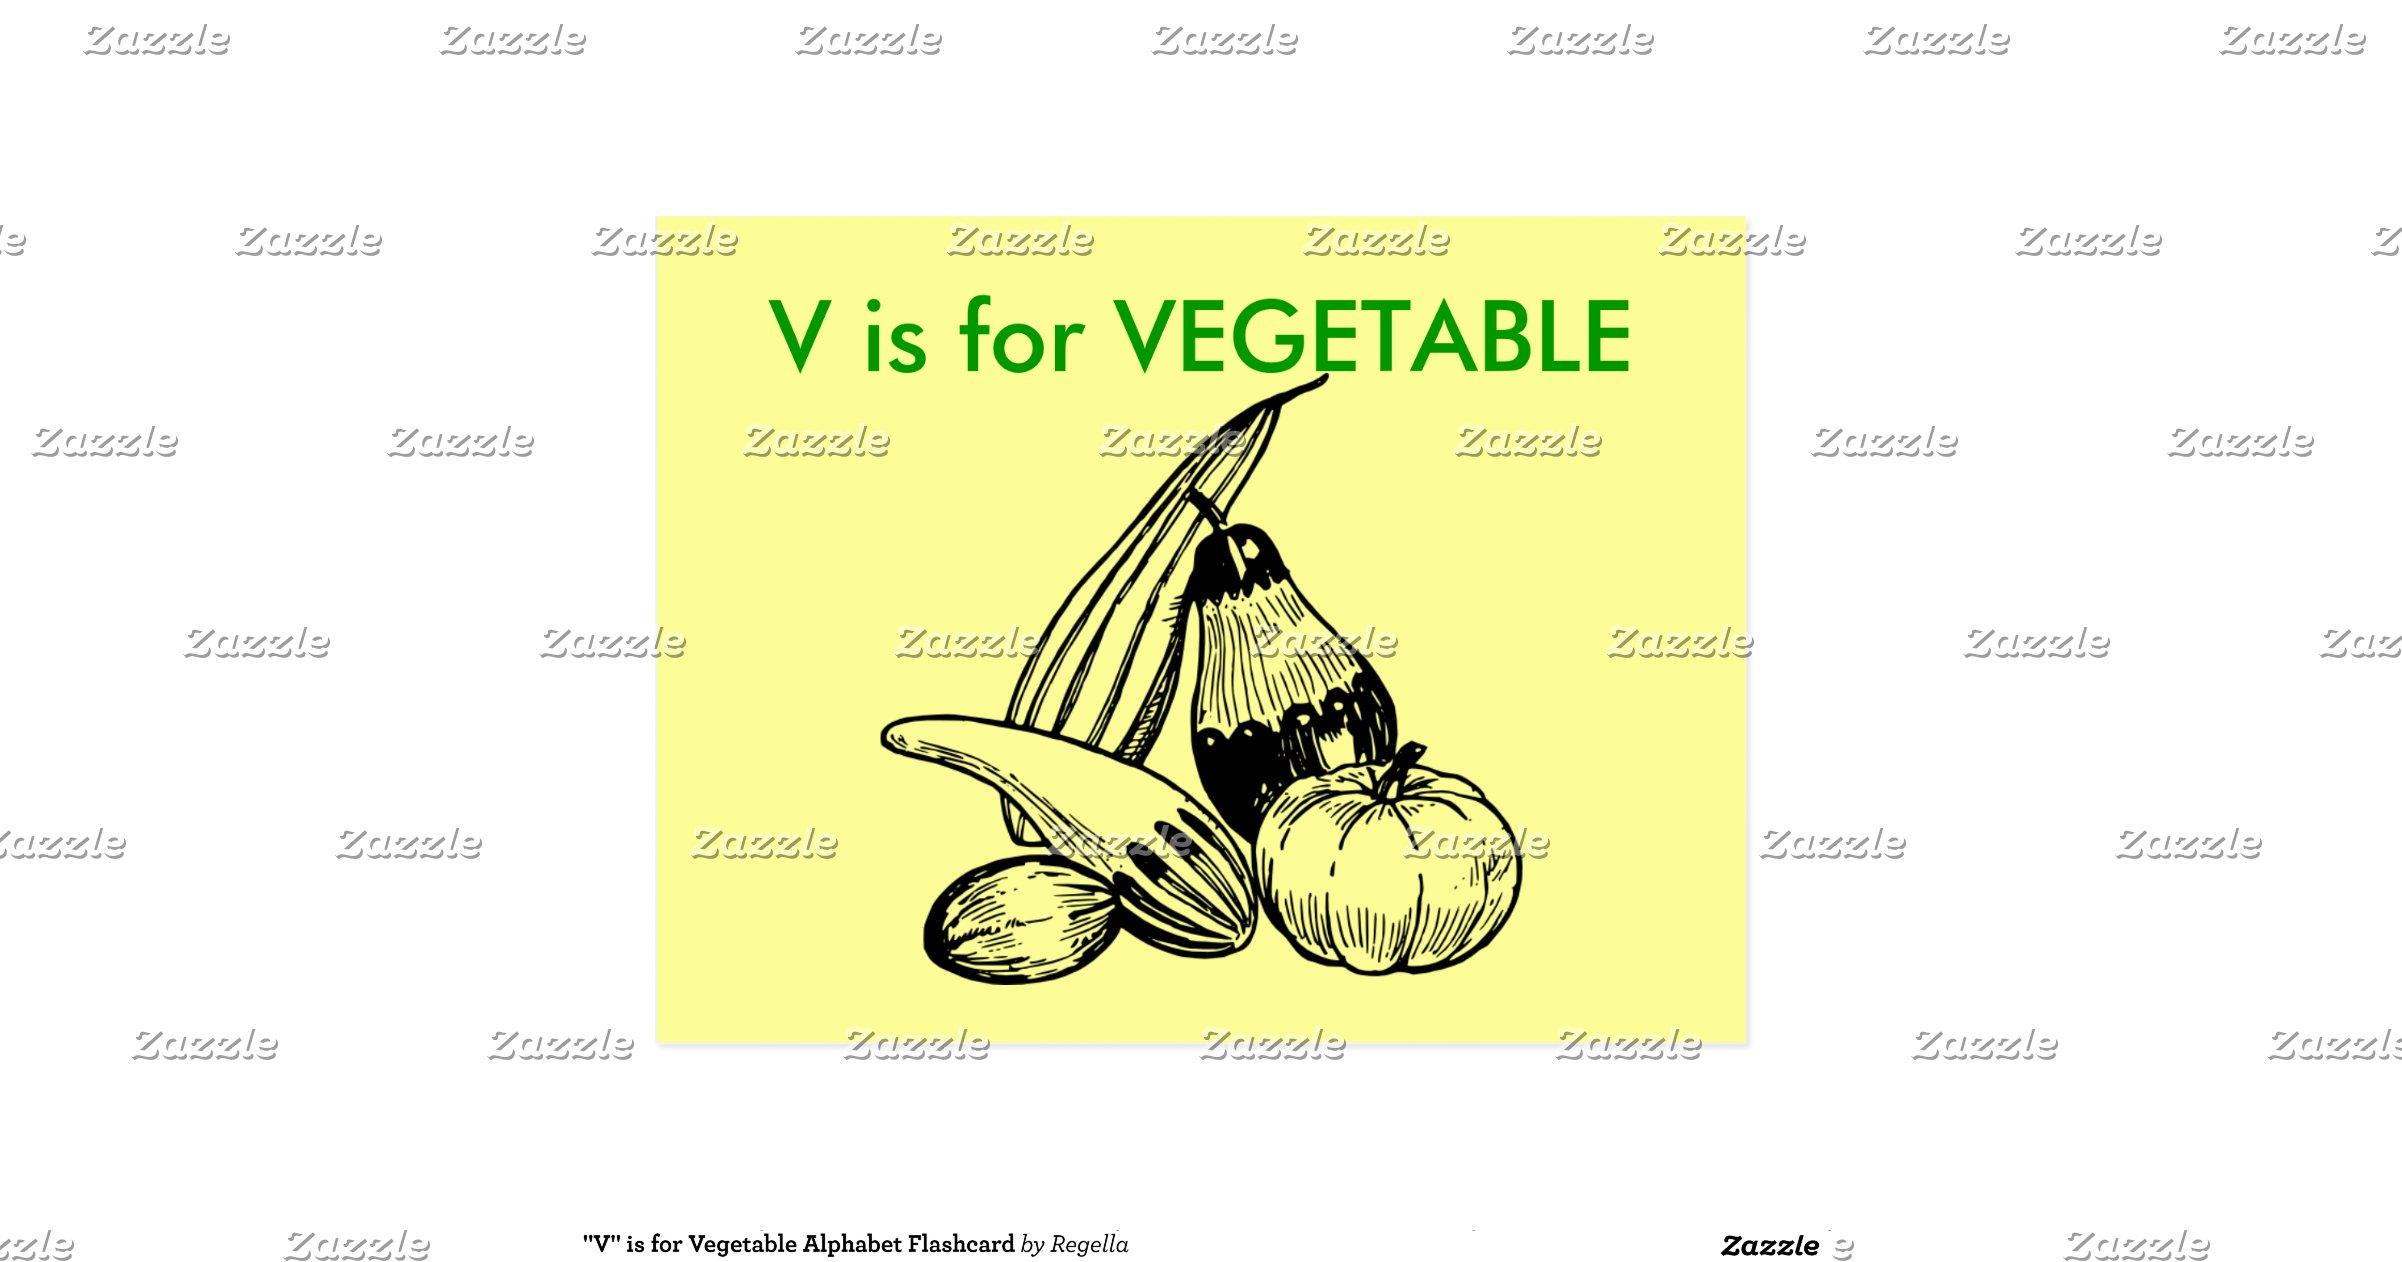 V Is For Vegetables v_is_for_vegeta...